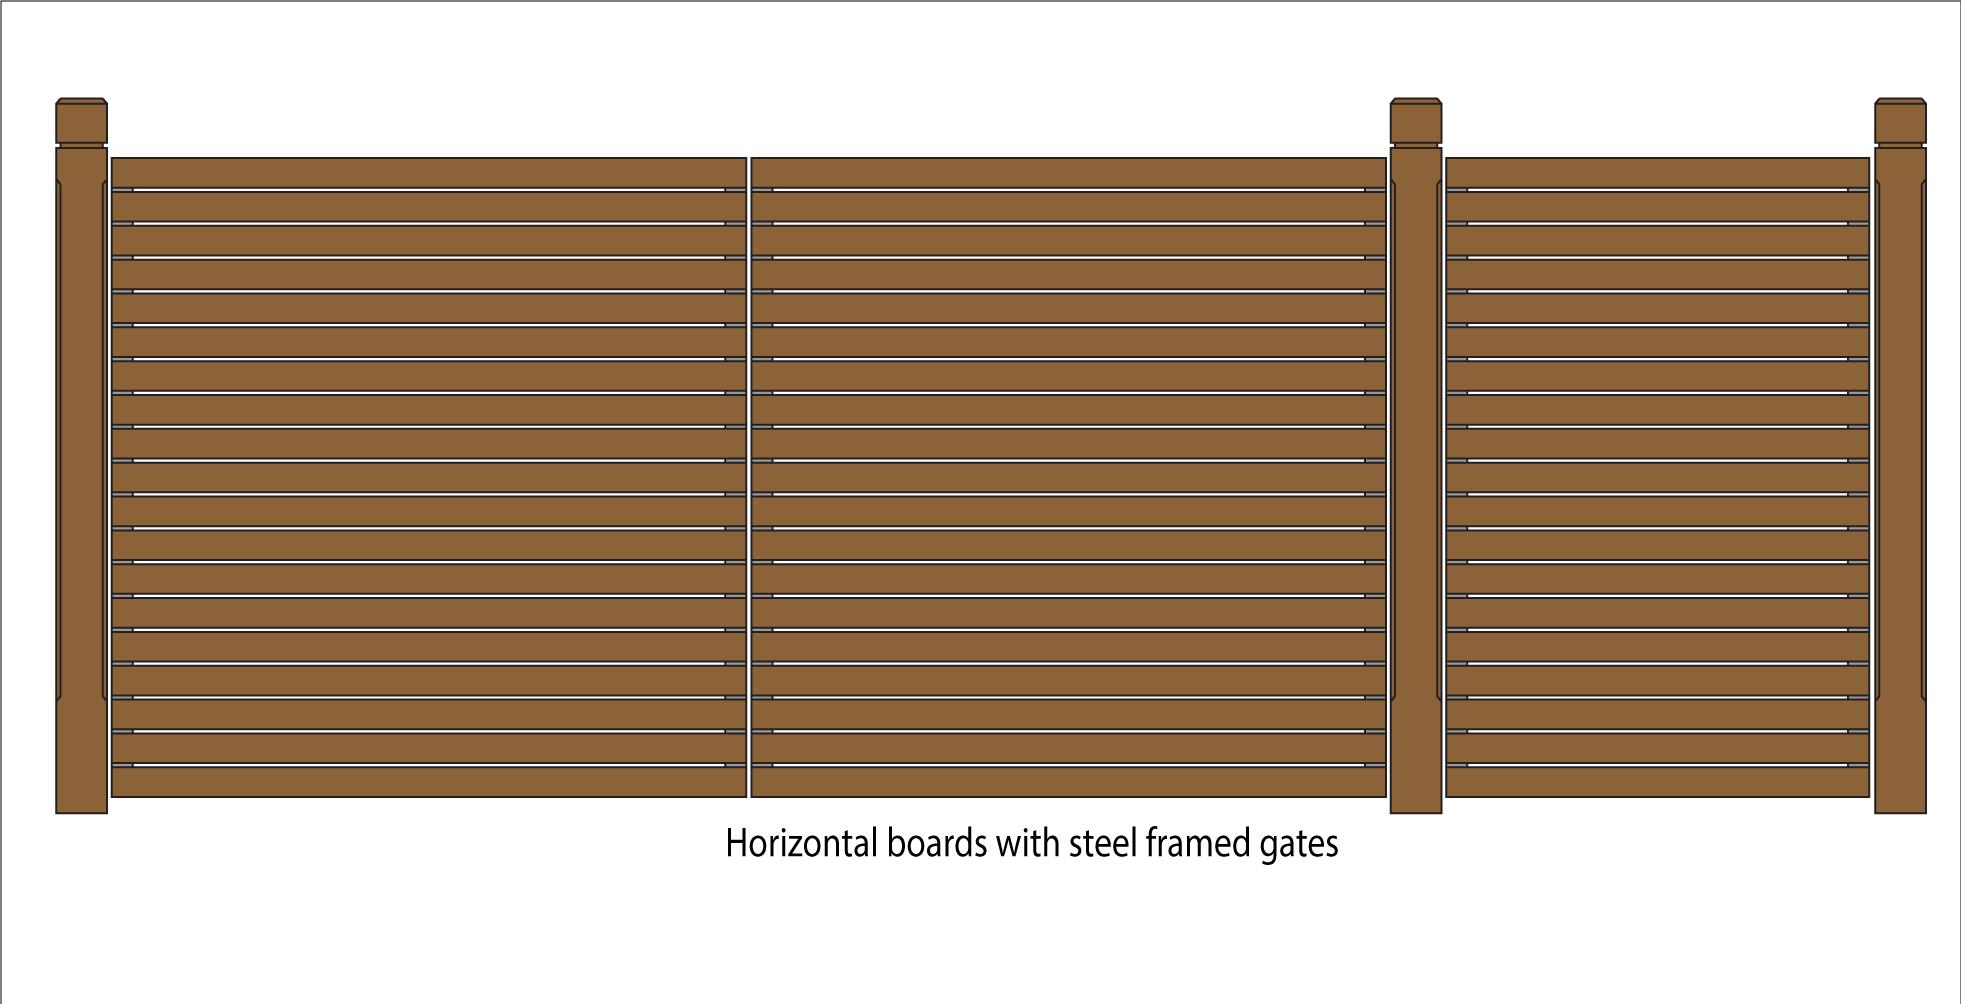 horizontal wood fence gate. Horizontal Boards On Steel Framed Gates Wood Fence Gate